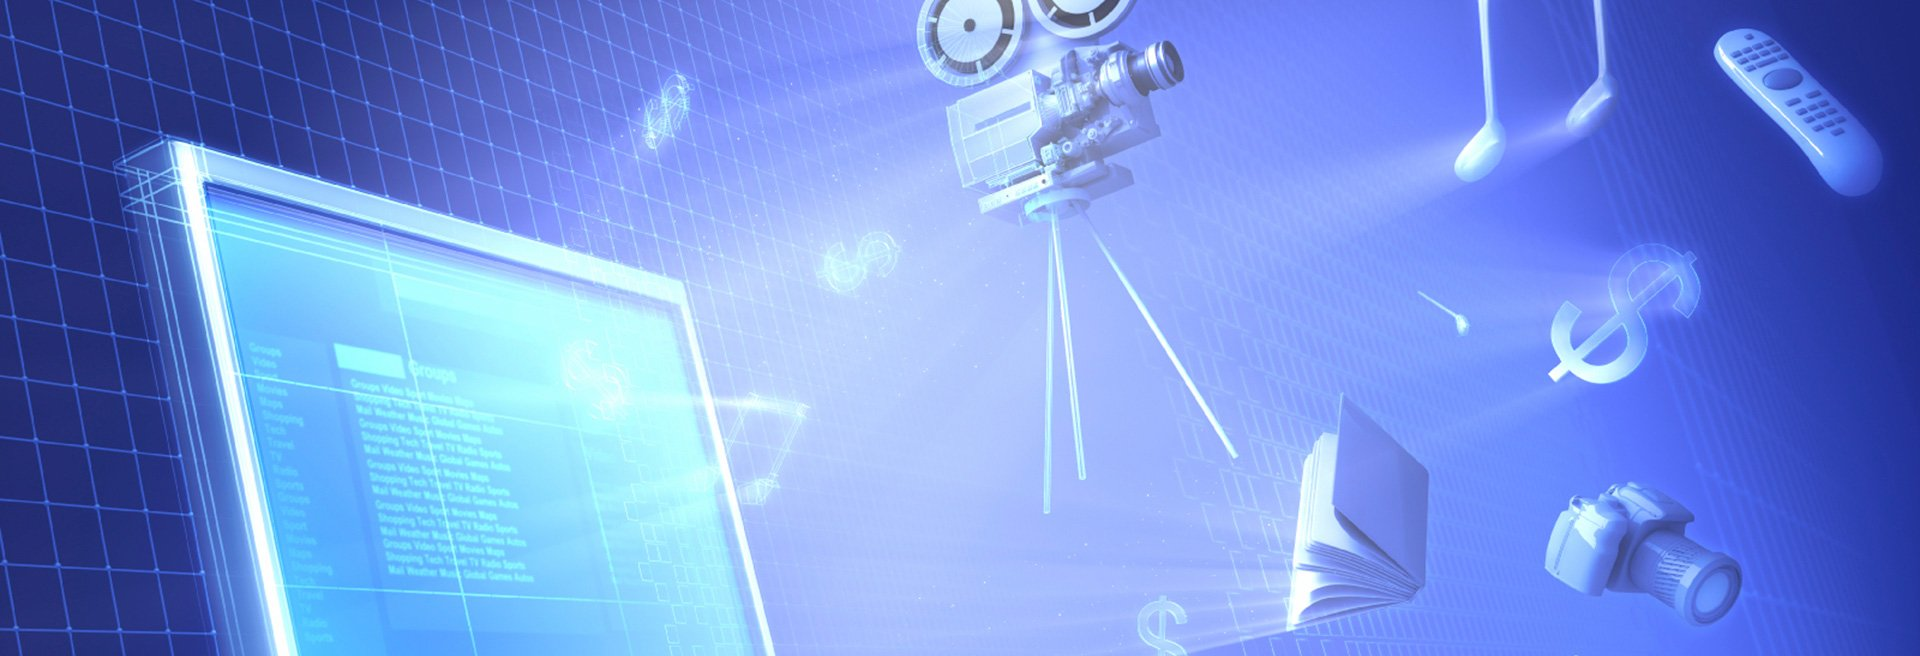 5 Reasons for Virtual Desktop Infrastructure (VDI) Adoption